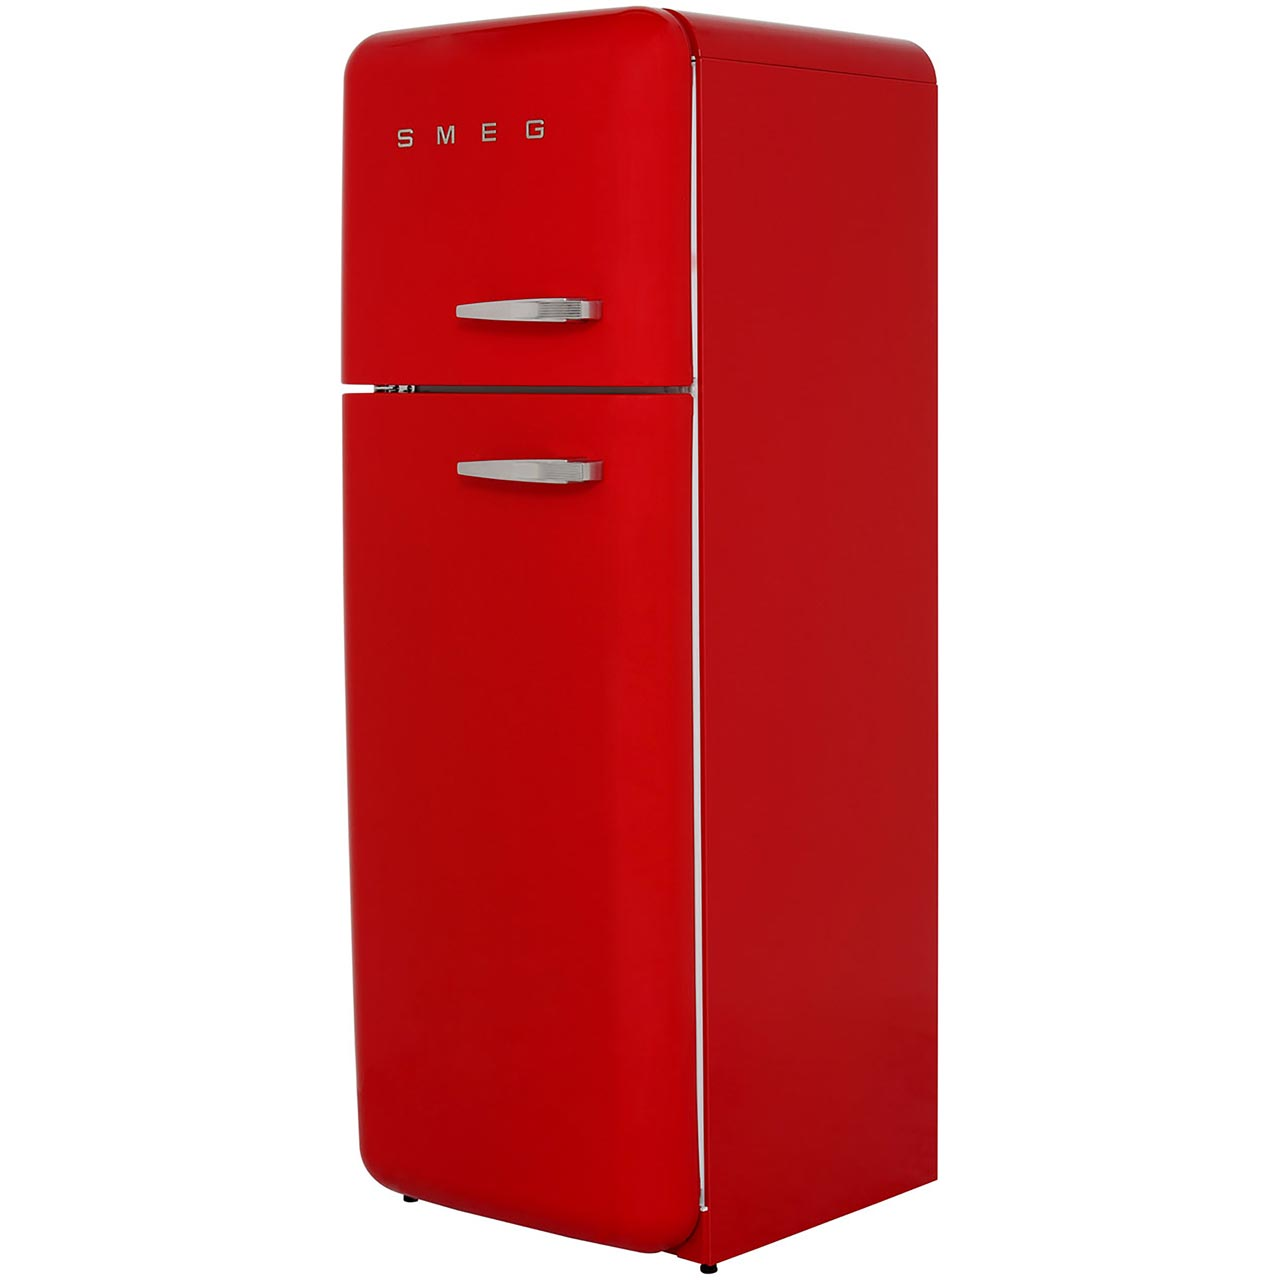 Boots kitchen appliances washing machines fridges more - Smeg productos ...